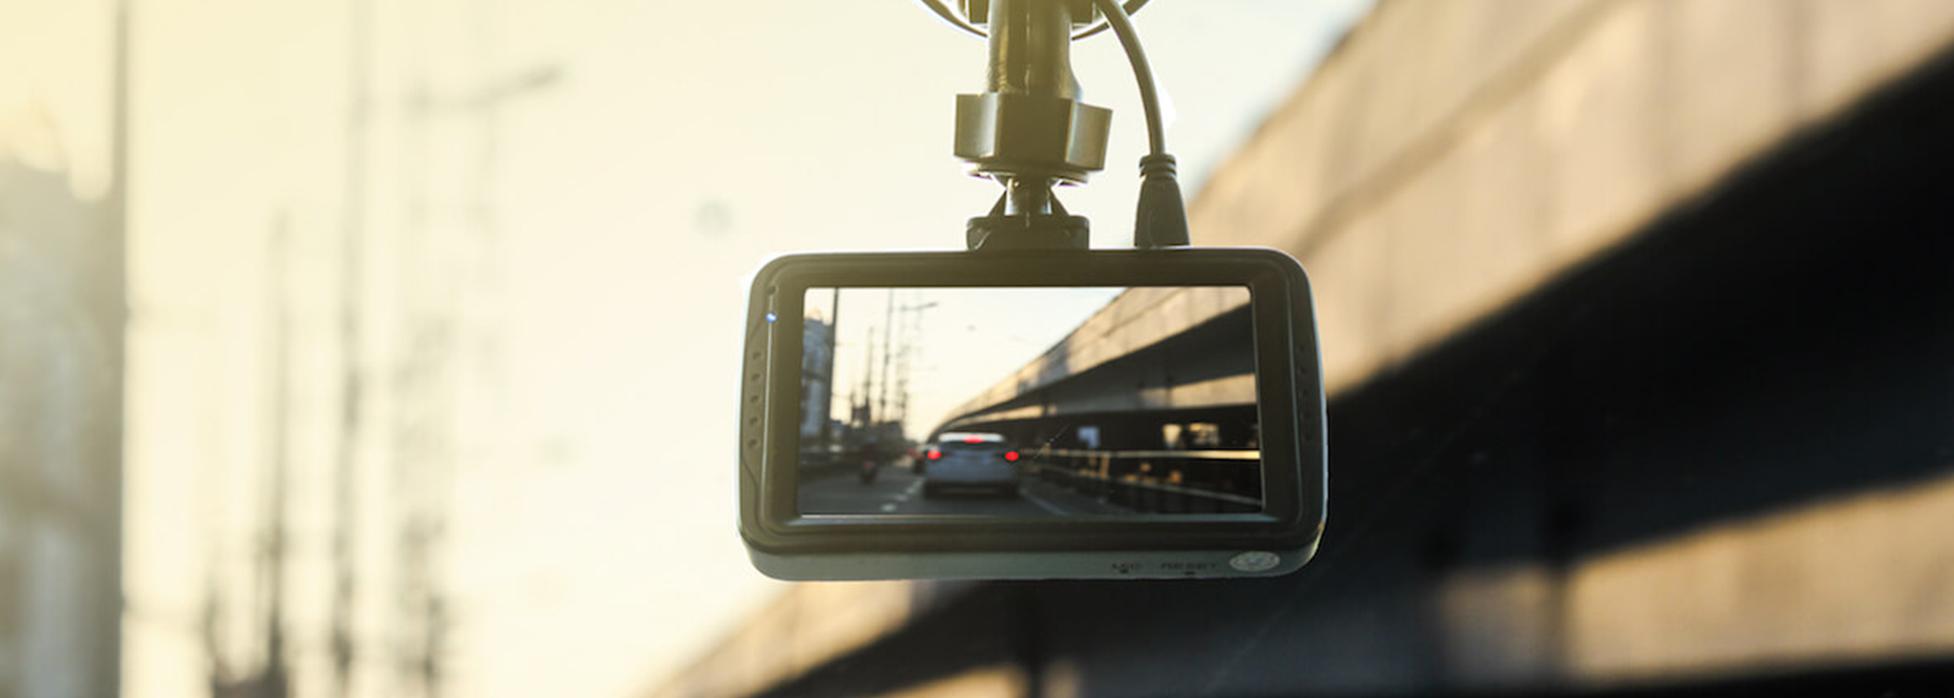 dash cams blog banner